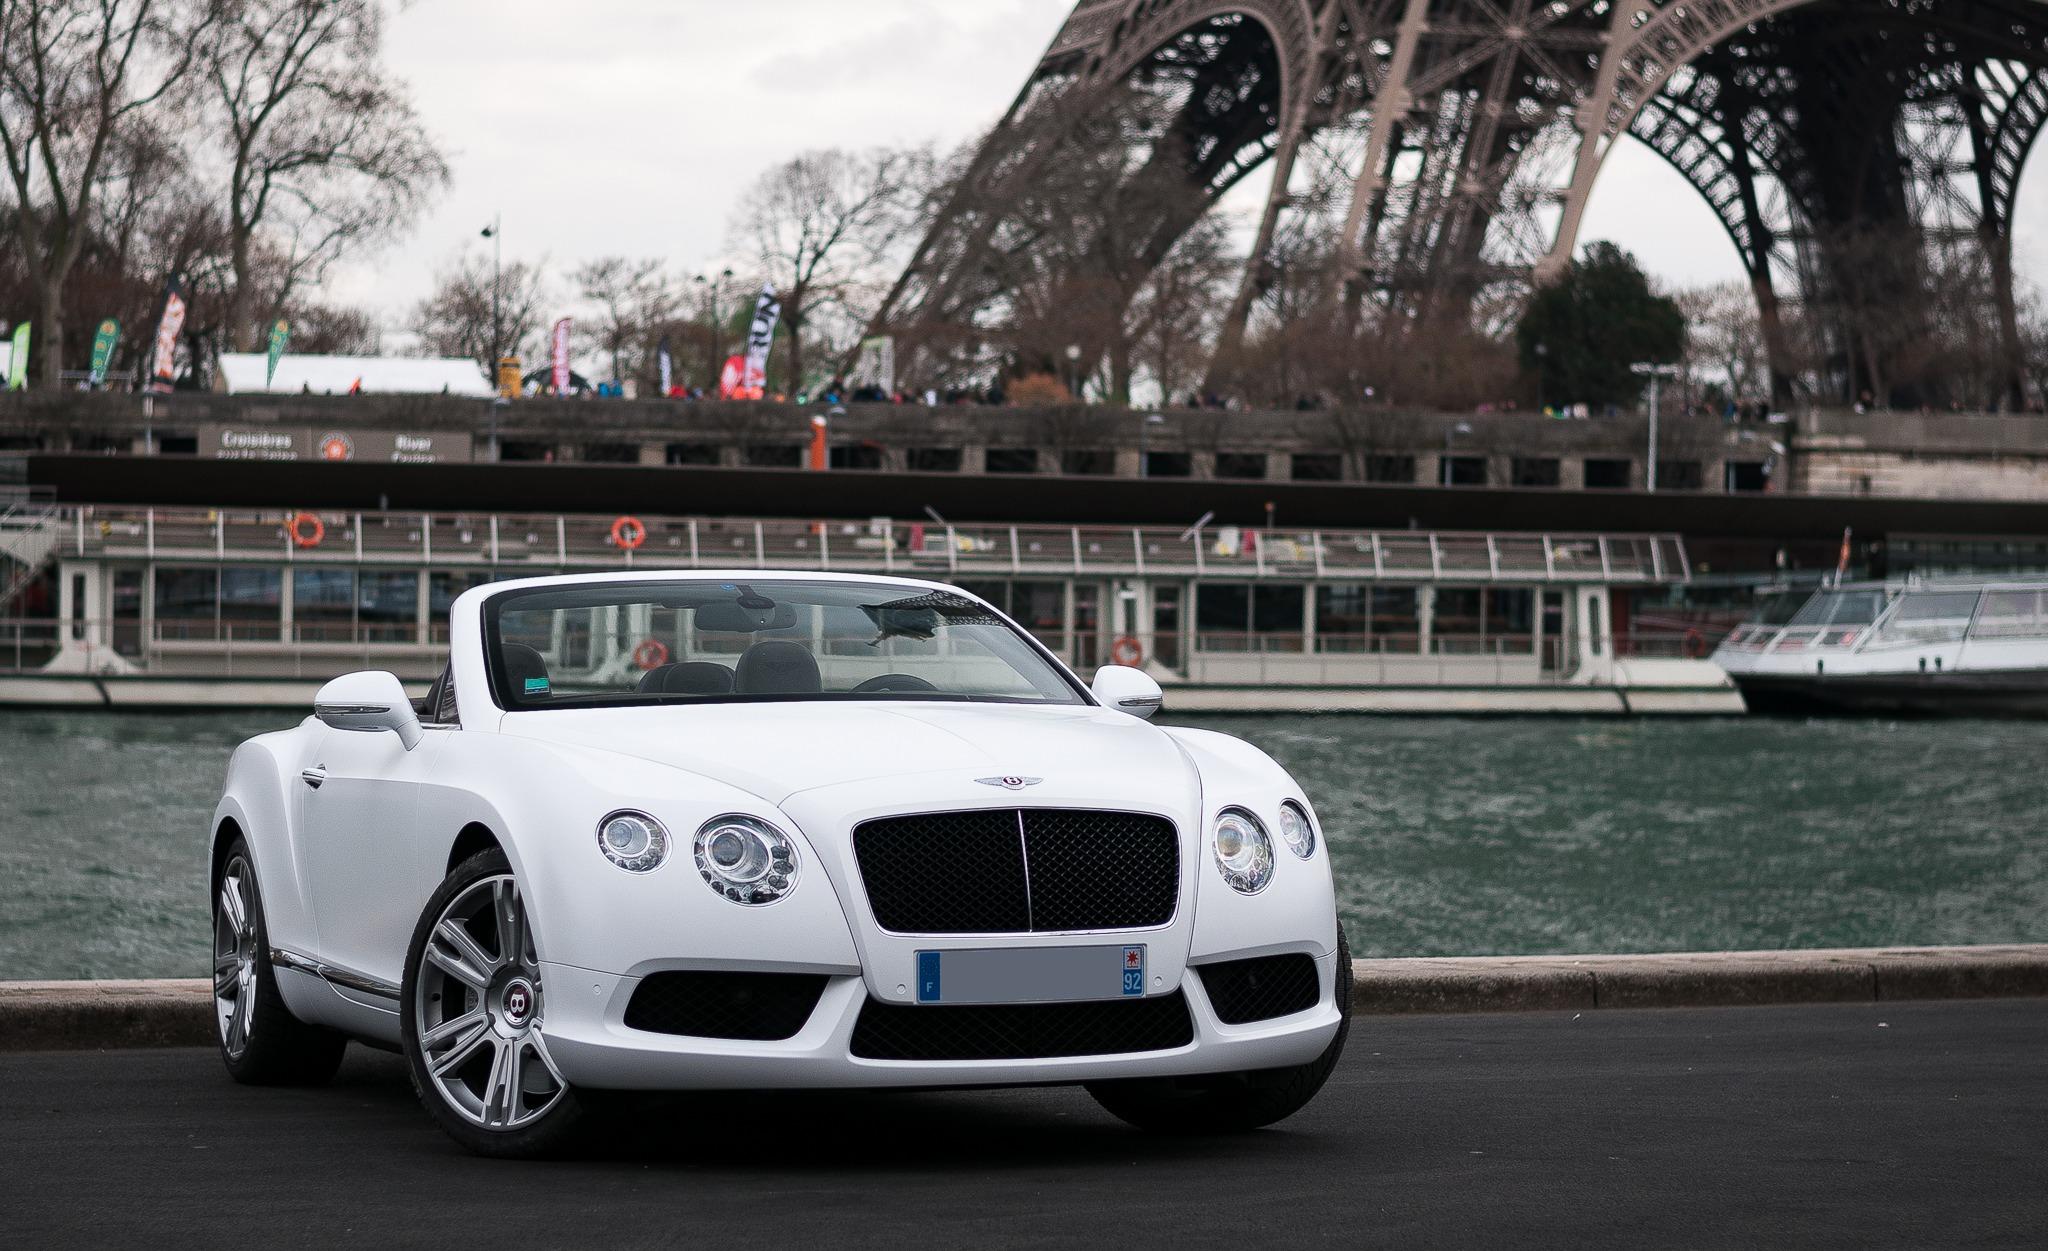 voiture luxe location - auto sport